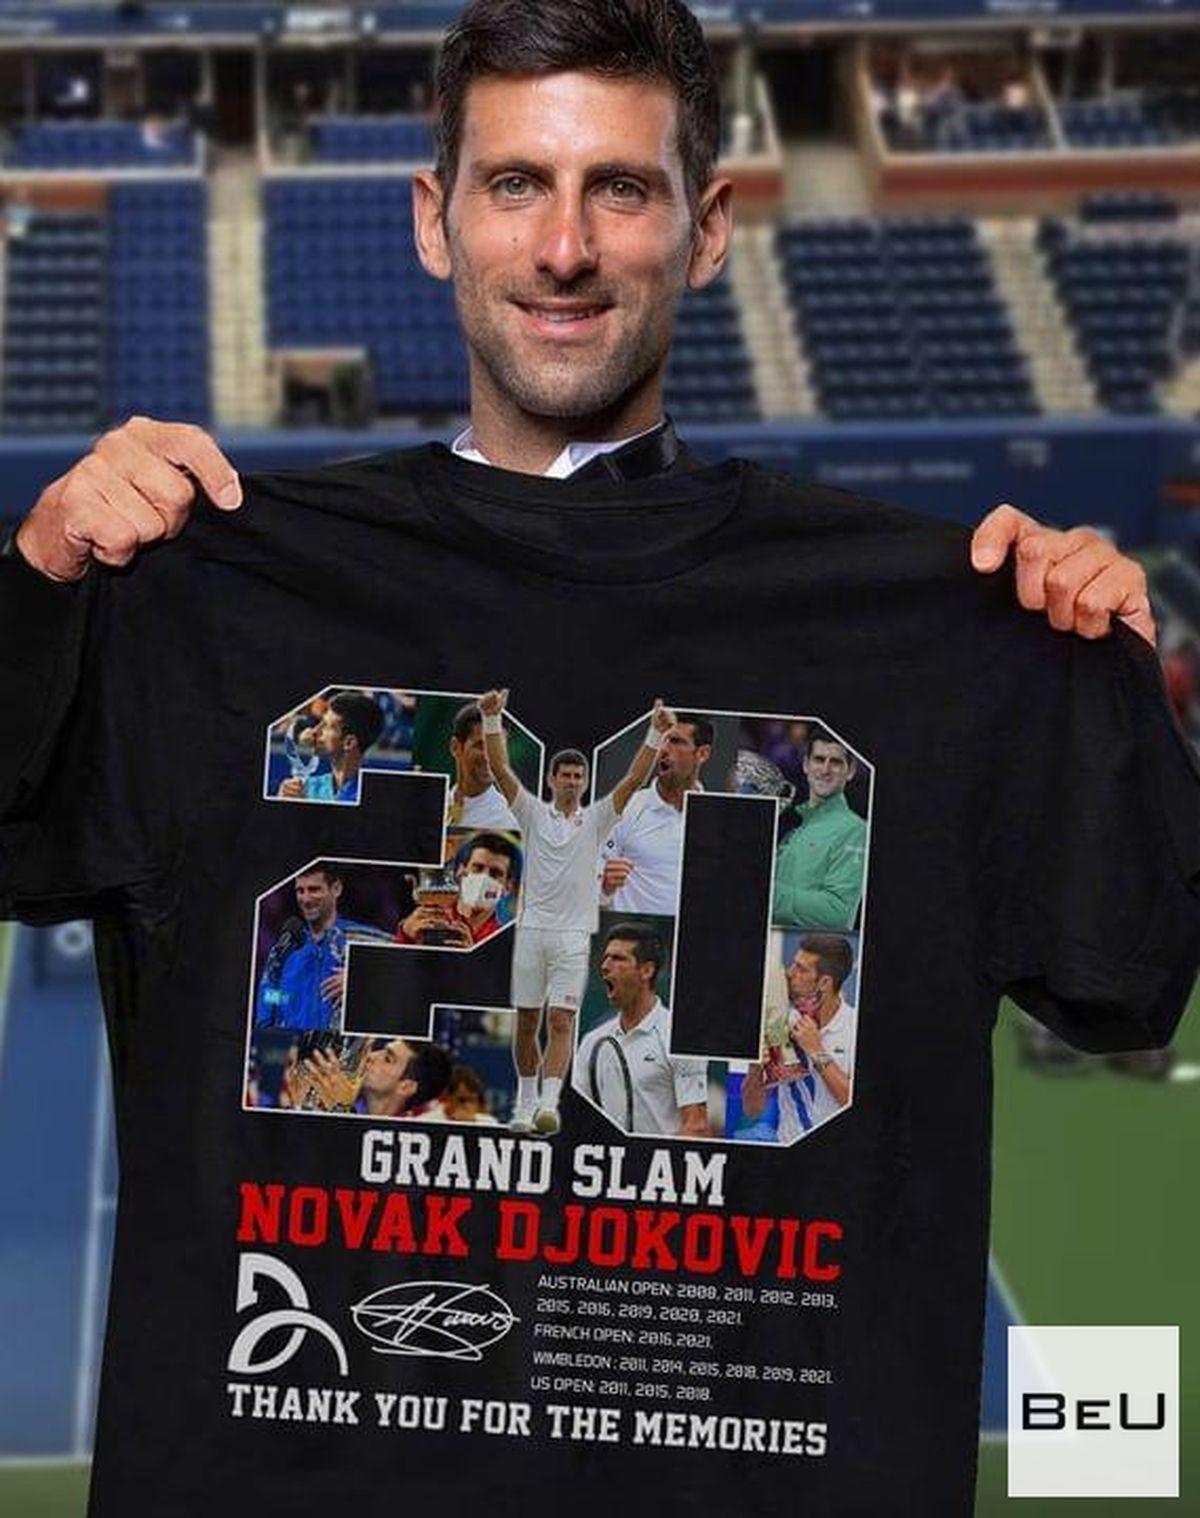 Grand Slam Novak Djokovic Thank You For The Memories Shirtv